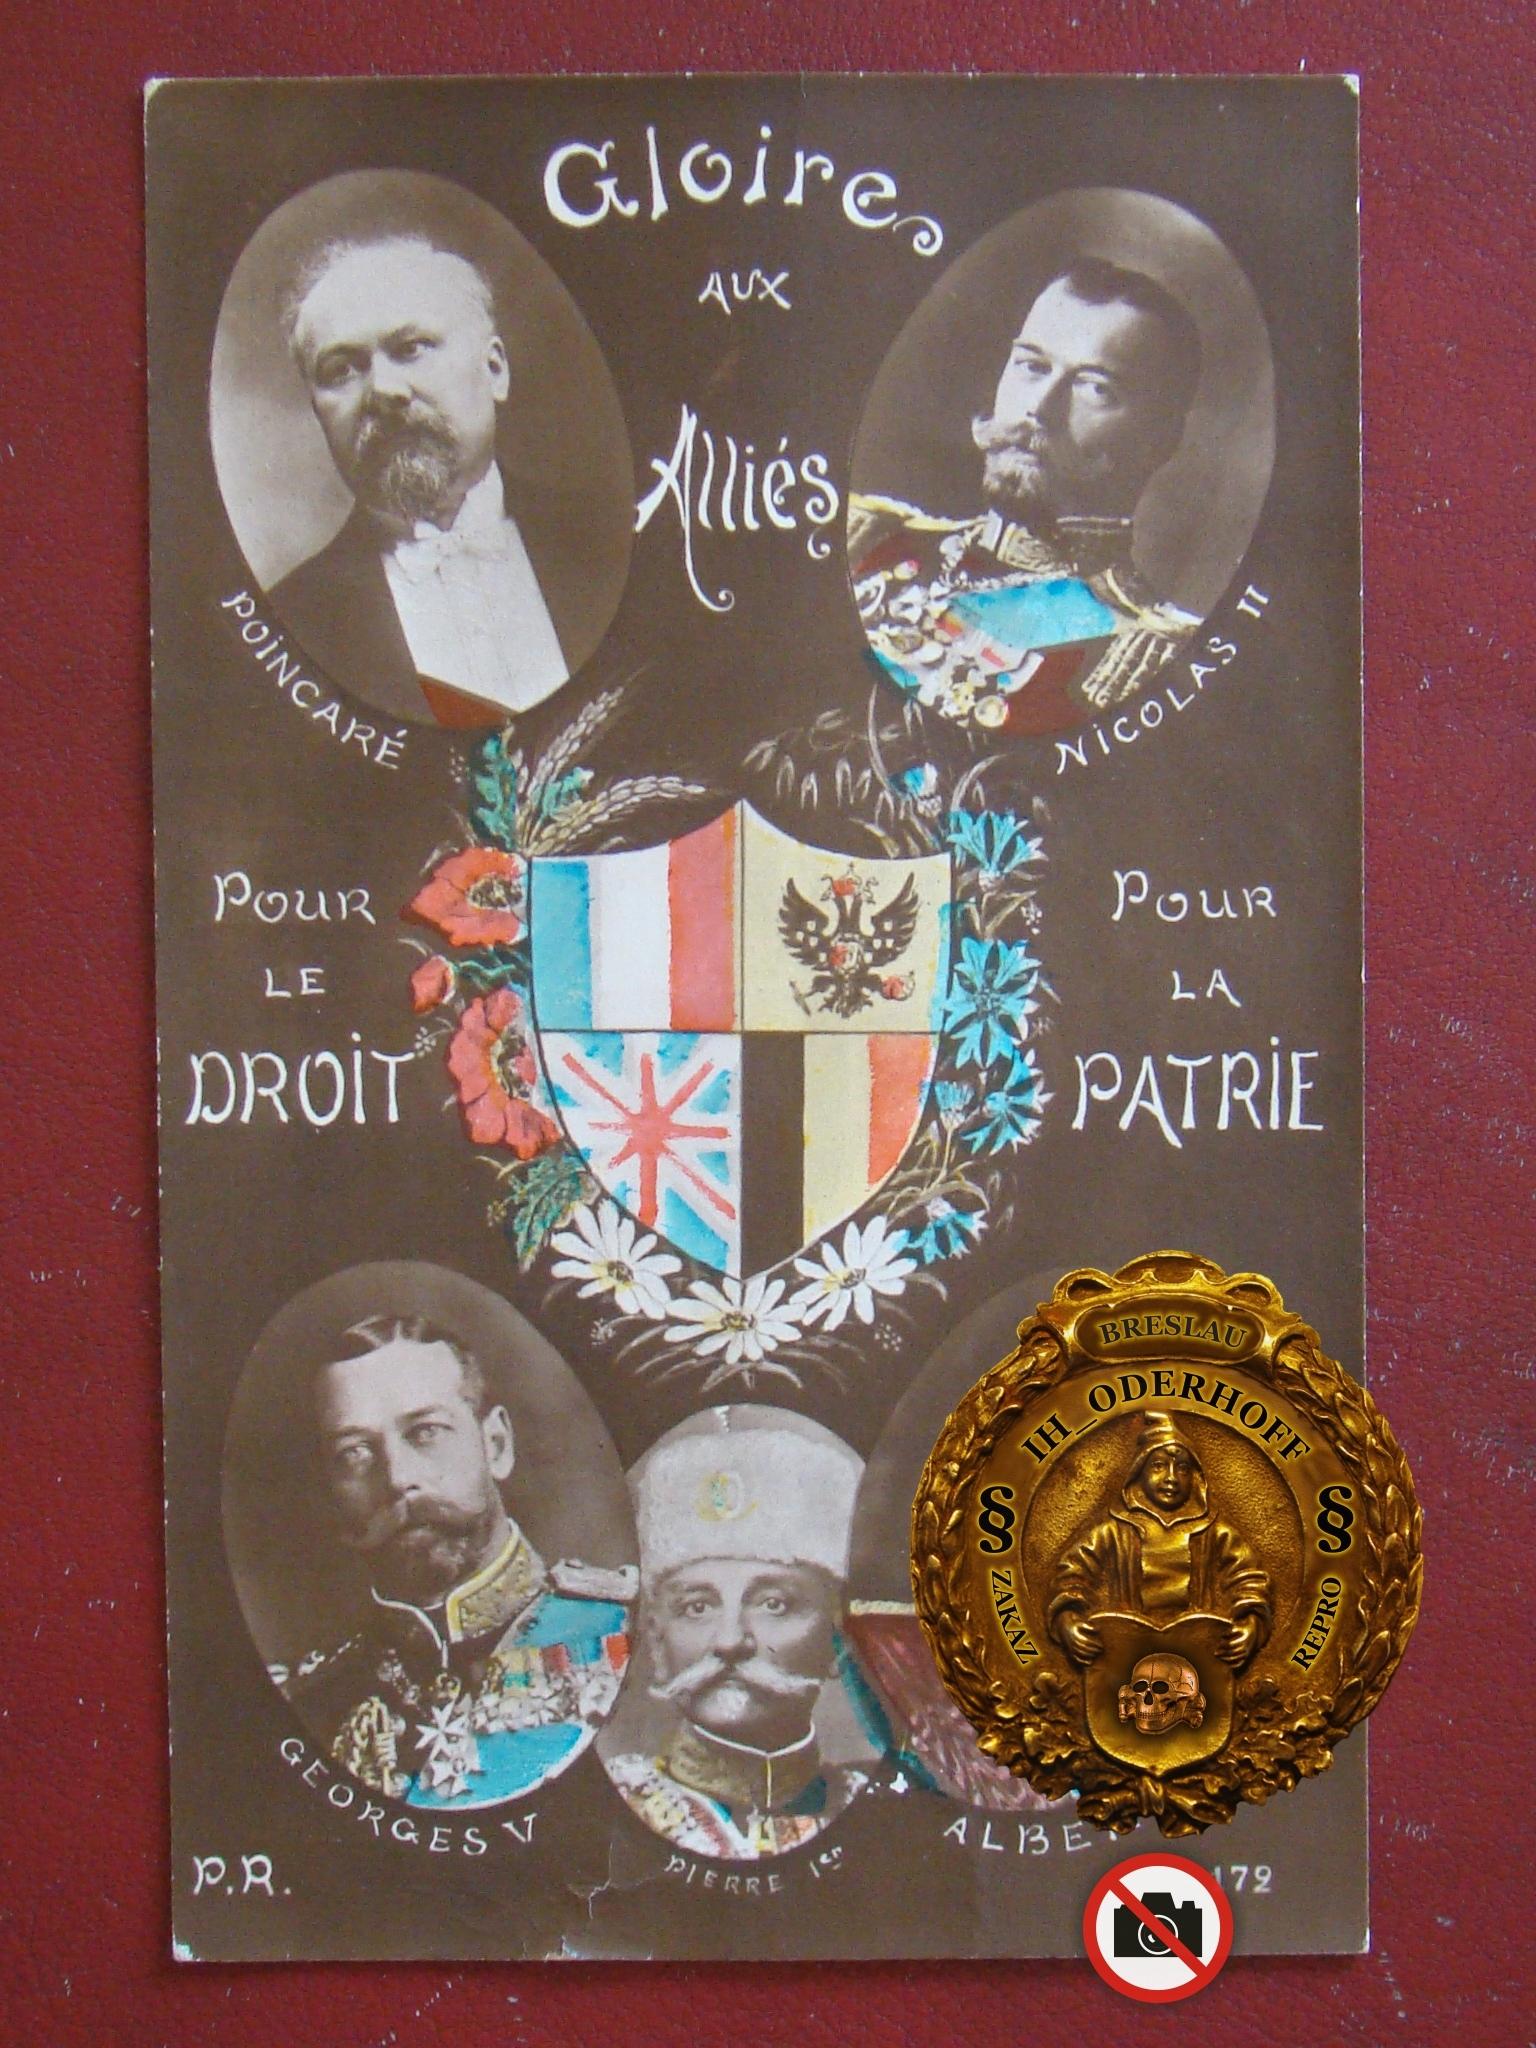 Anglia Glorie aux Allies,Orgifoto=Paris 1914 C5522